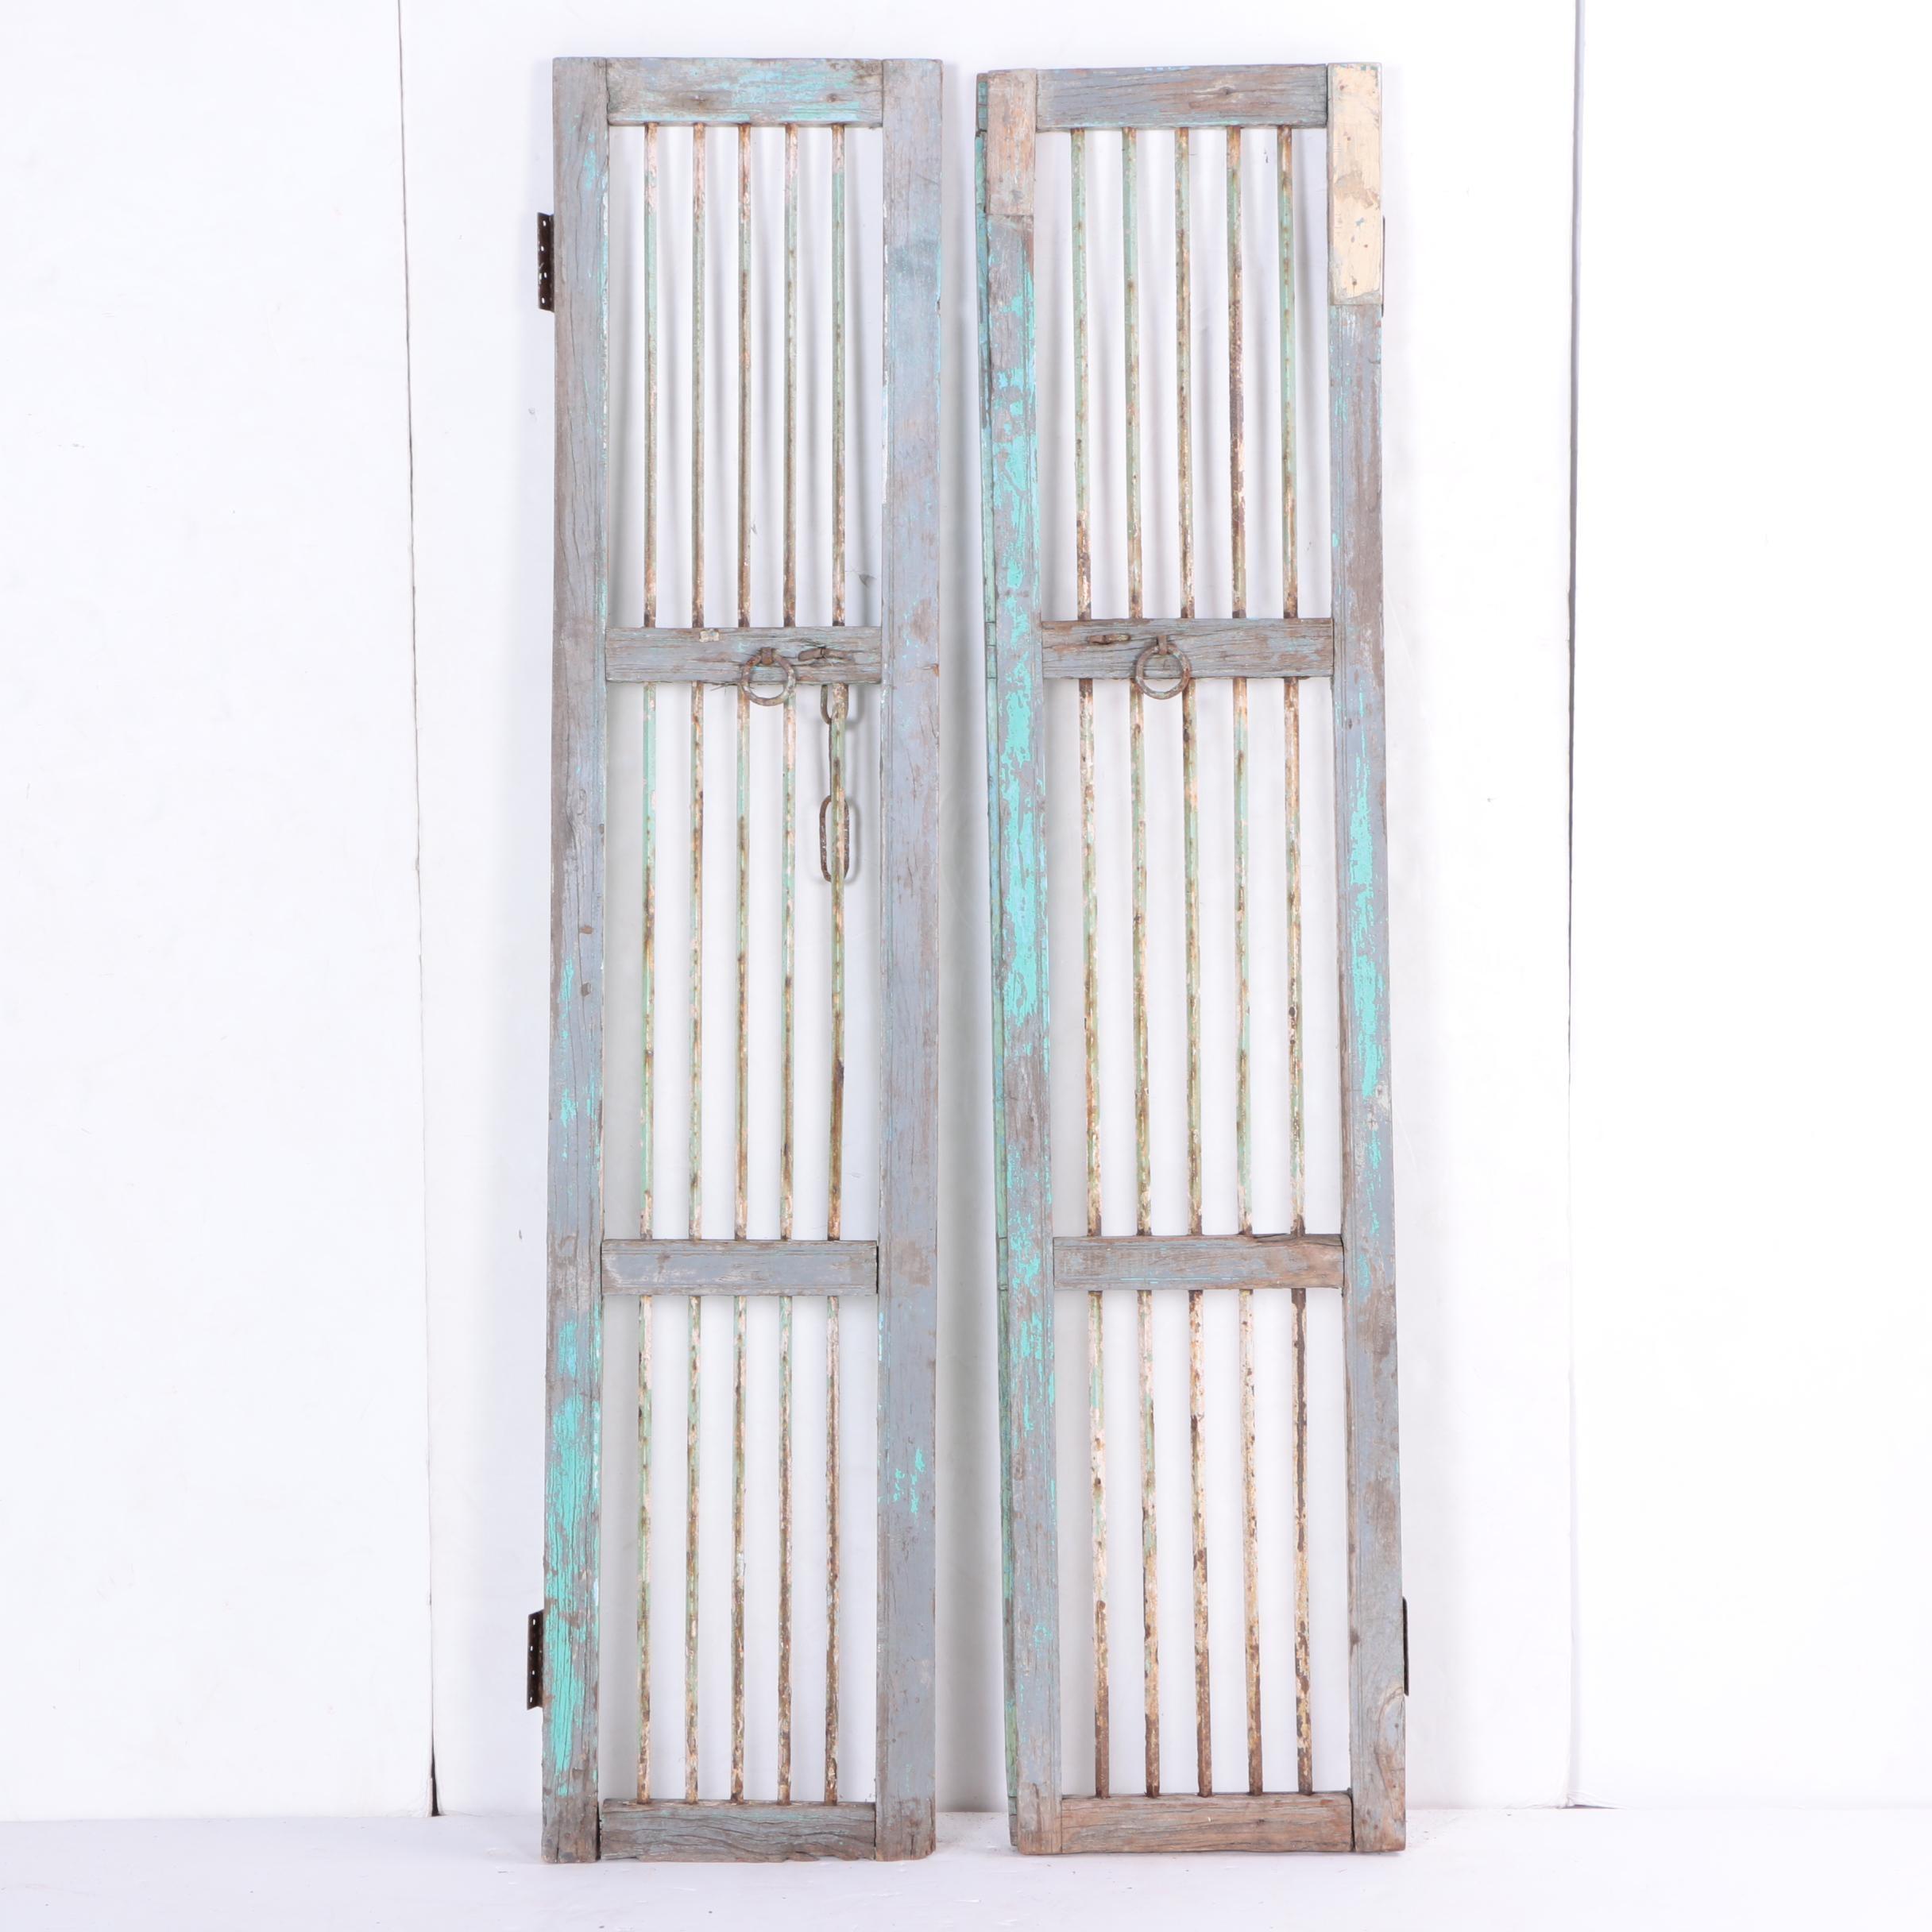 Pair of Rustic Doors